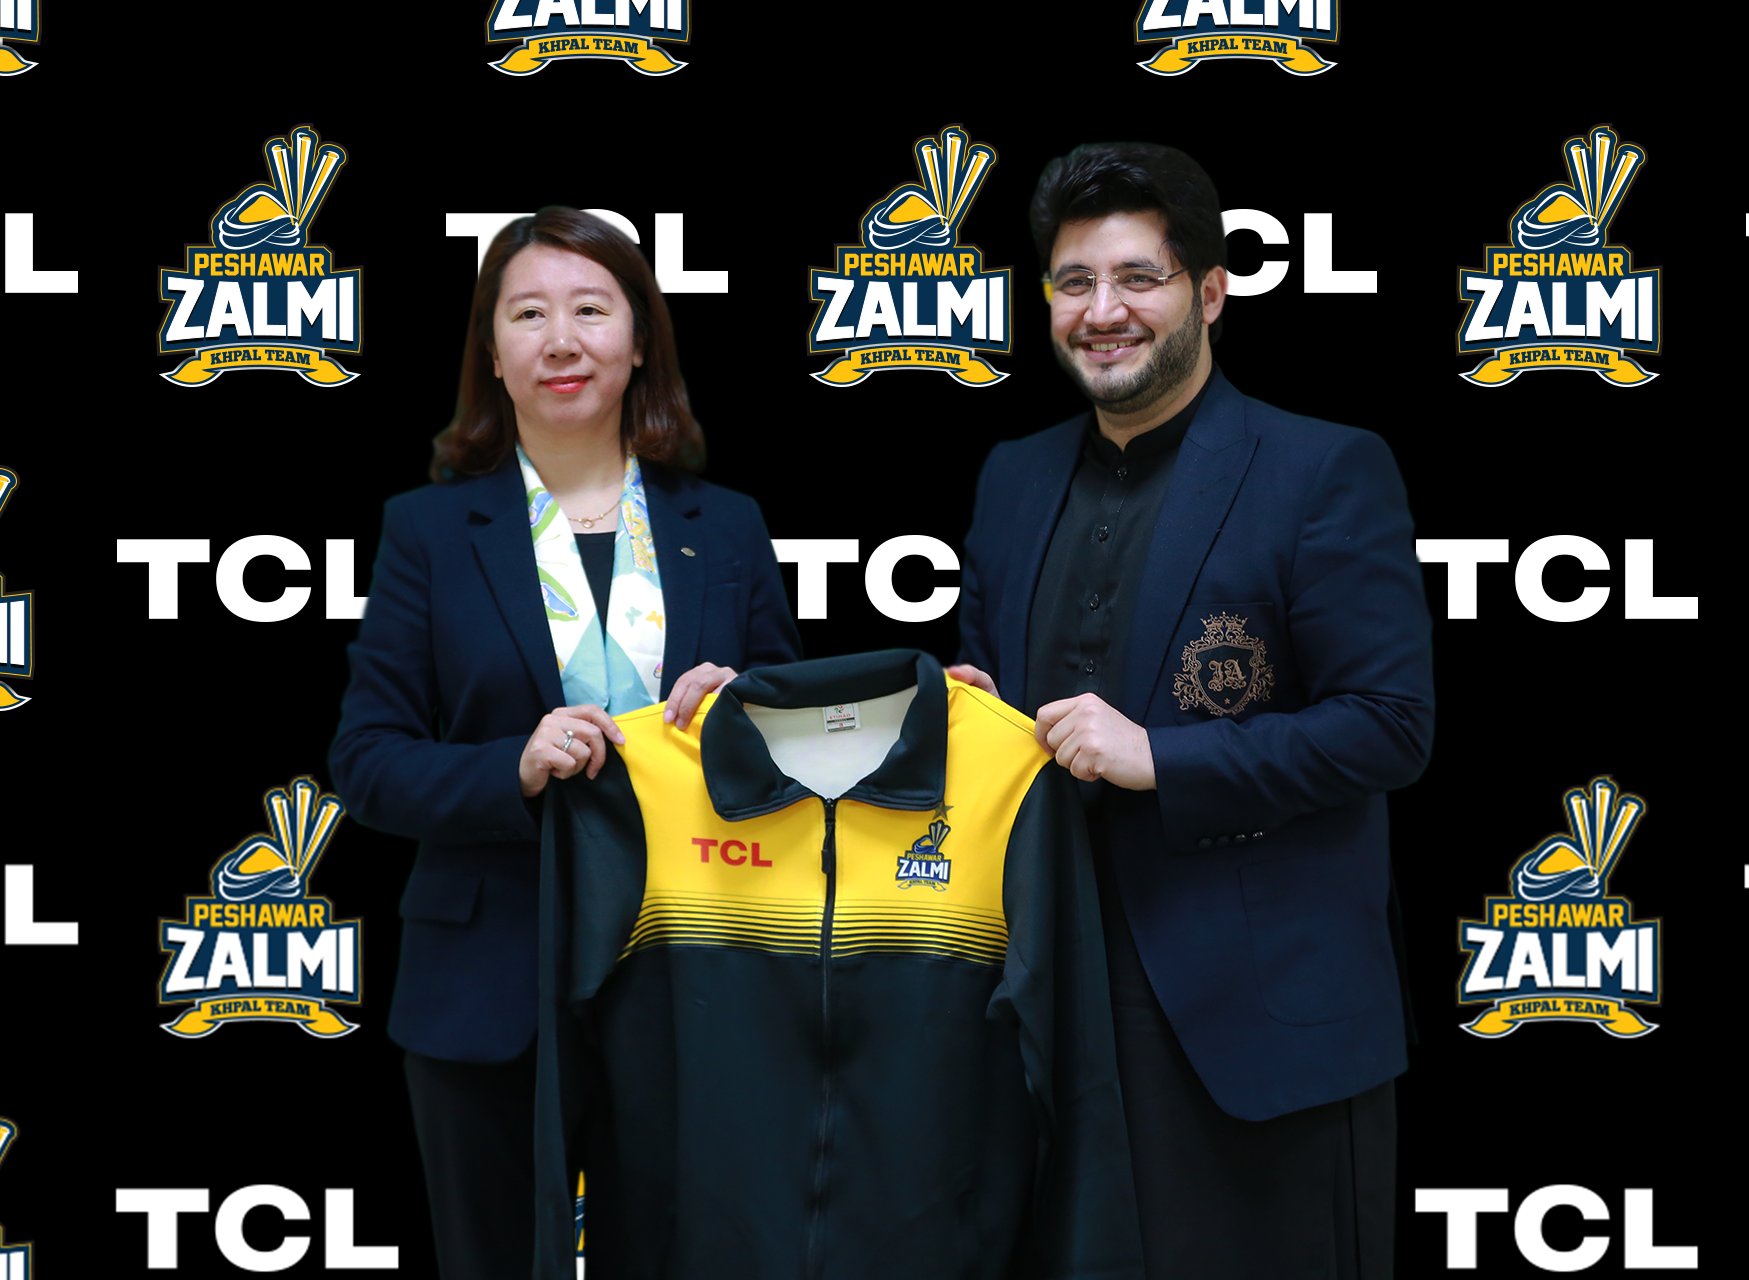 TCL-Zalmi-TechJuice